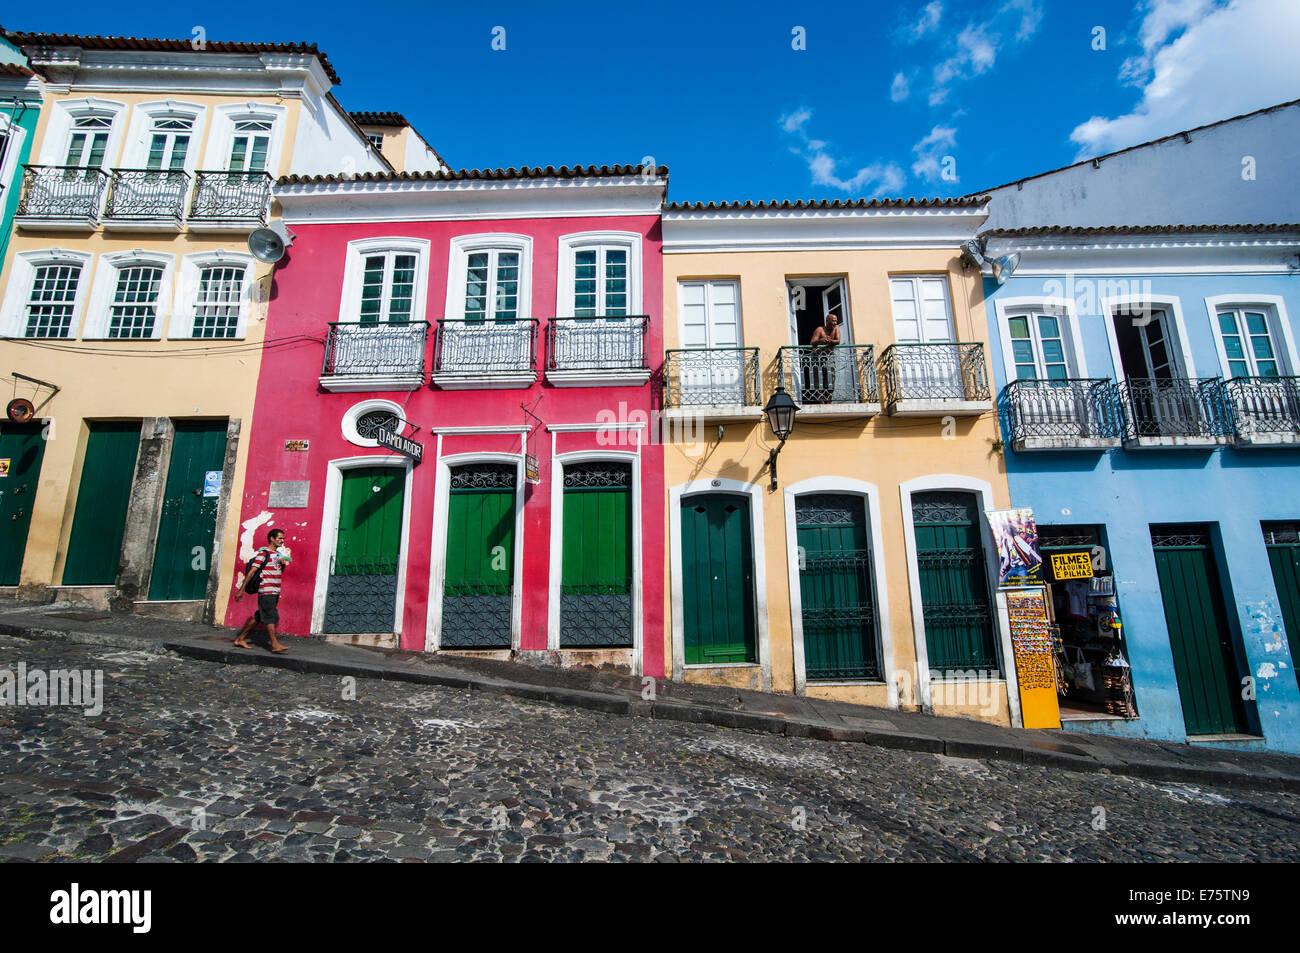 Colonial architecture in the Pelourinho, Salvador da Bahia, Brazil Stock Photo